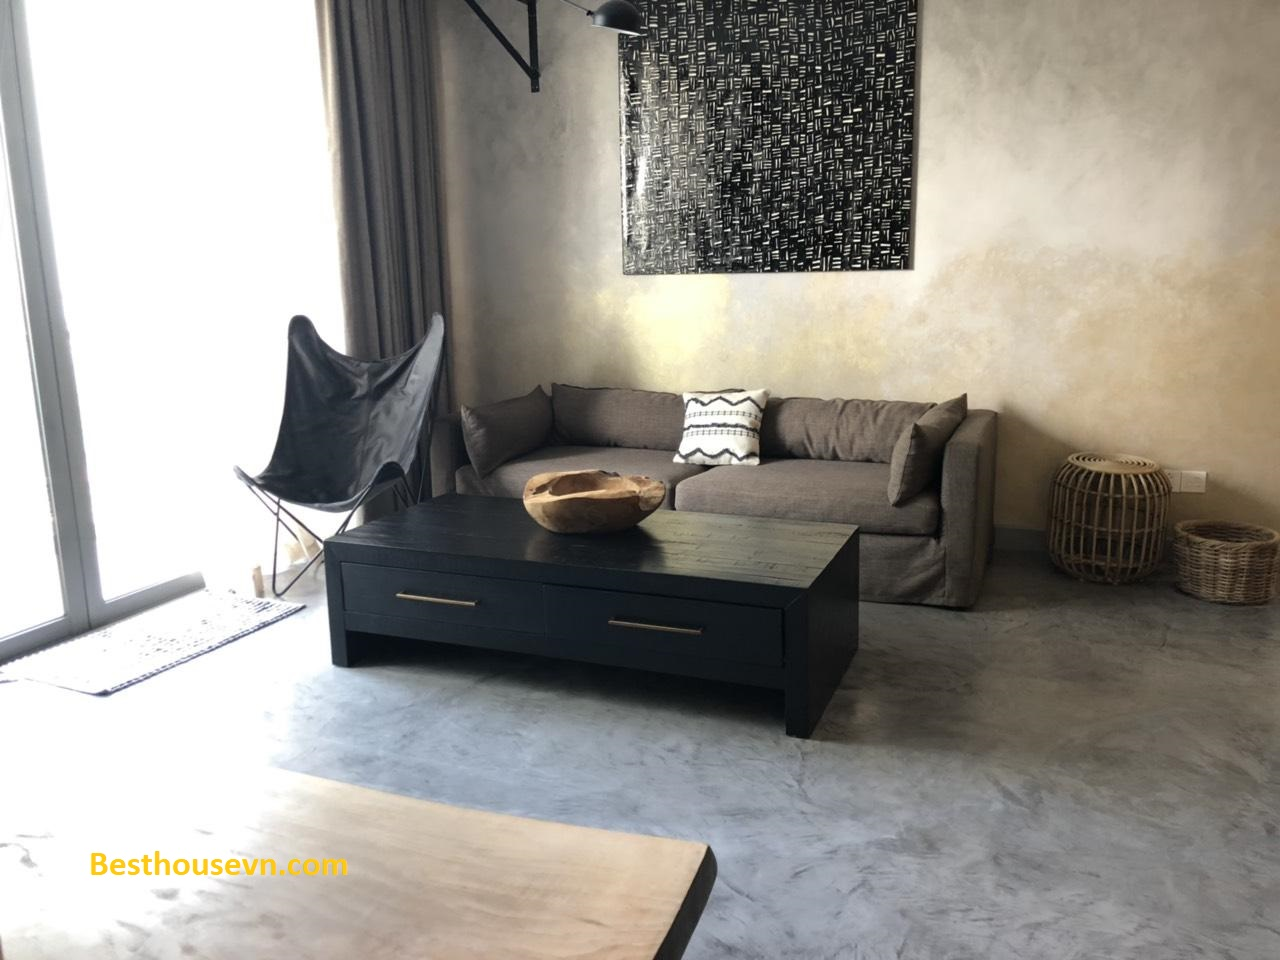 Apartment-for-rent-in-river-park-premier-district -7-4